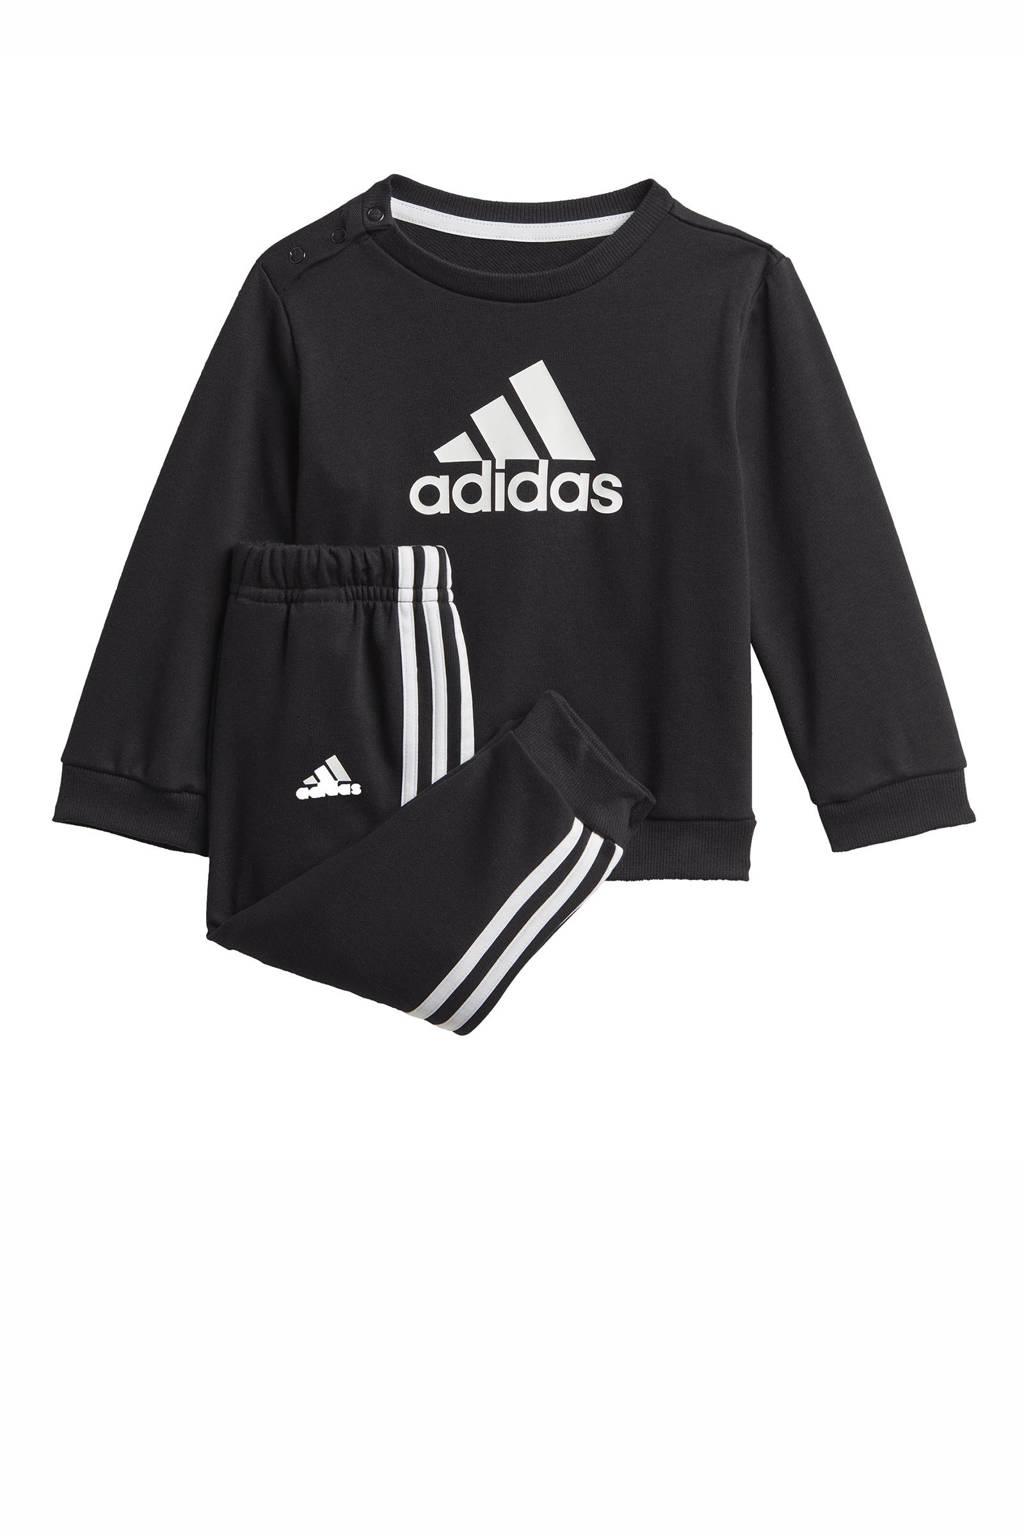 adidas Performance   joggingpak zwart/wit, Zwart/wit